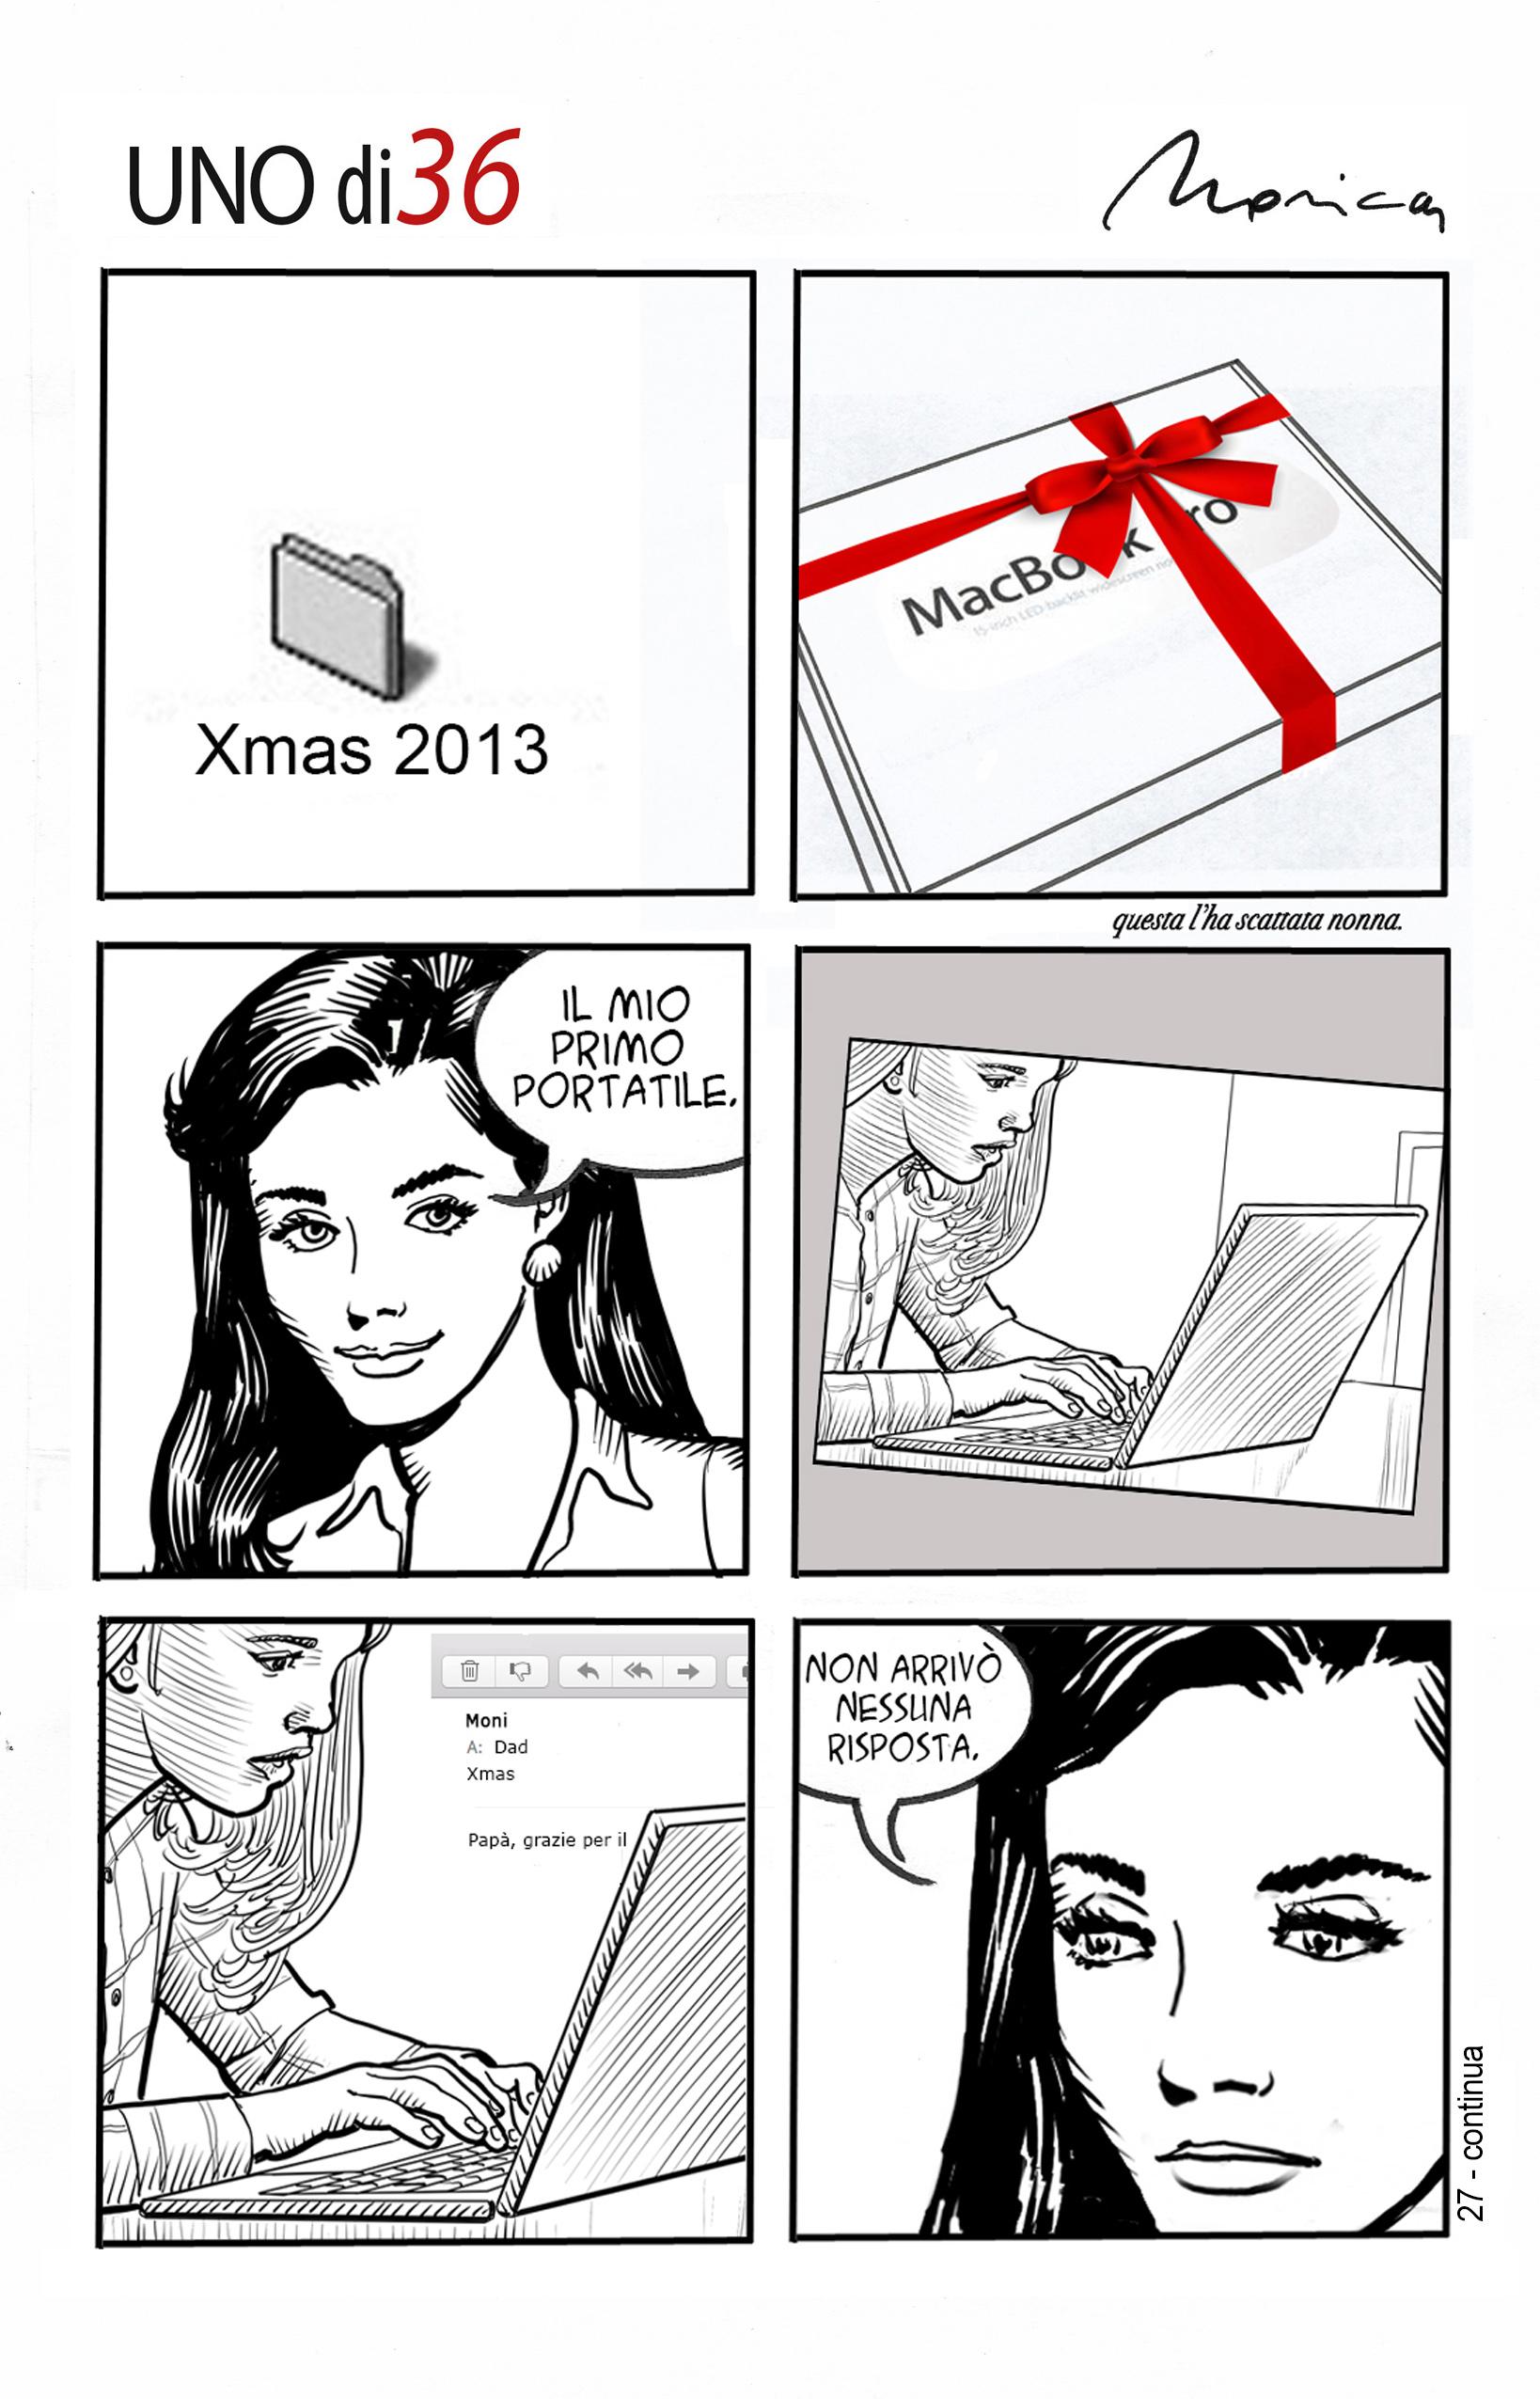 Uno di 36 #27 Special Christmas